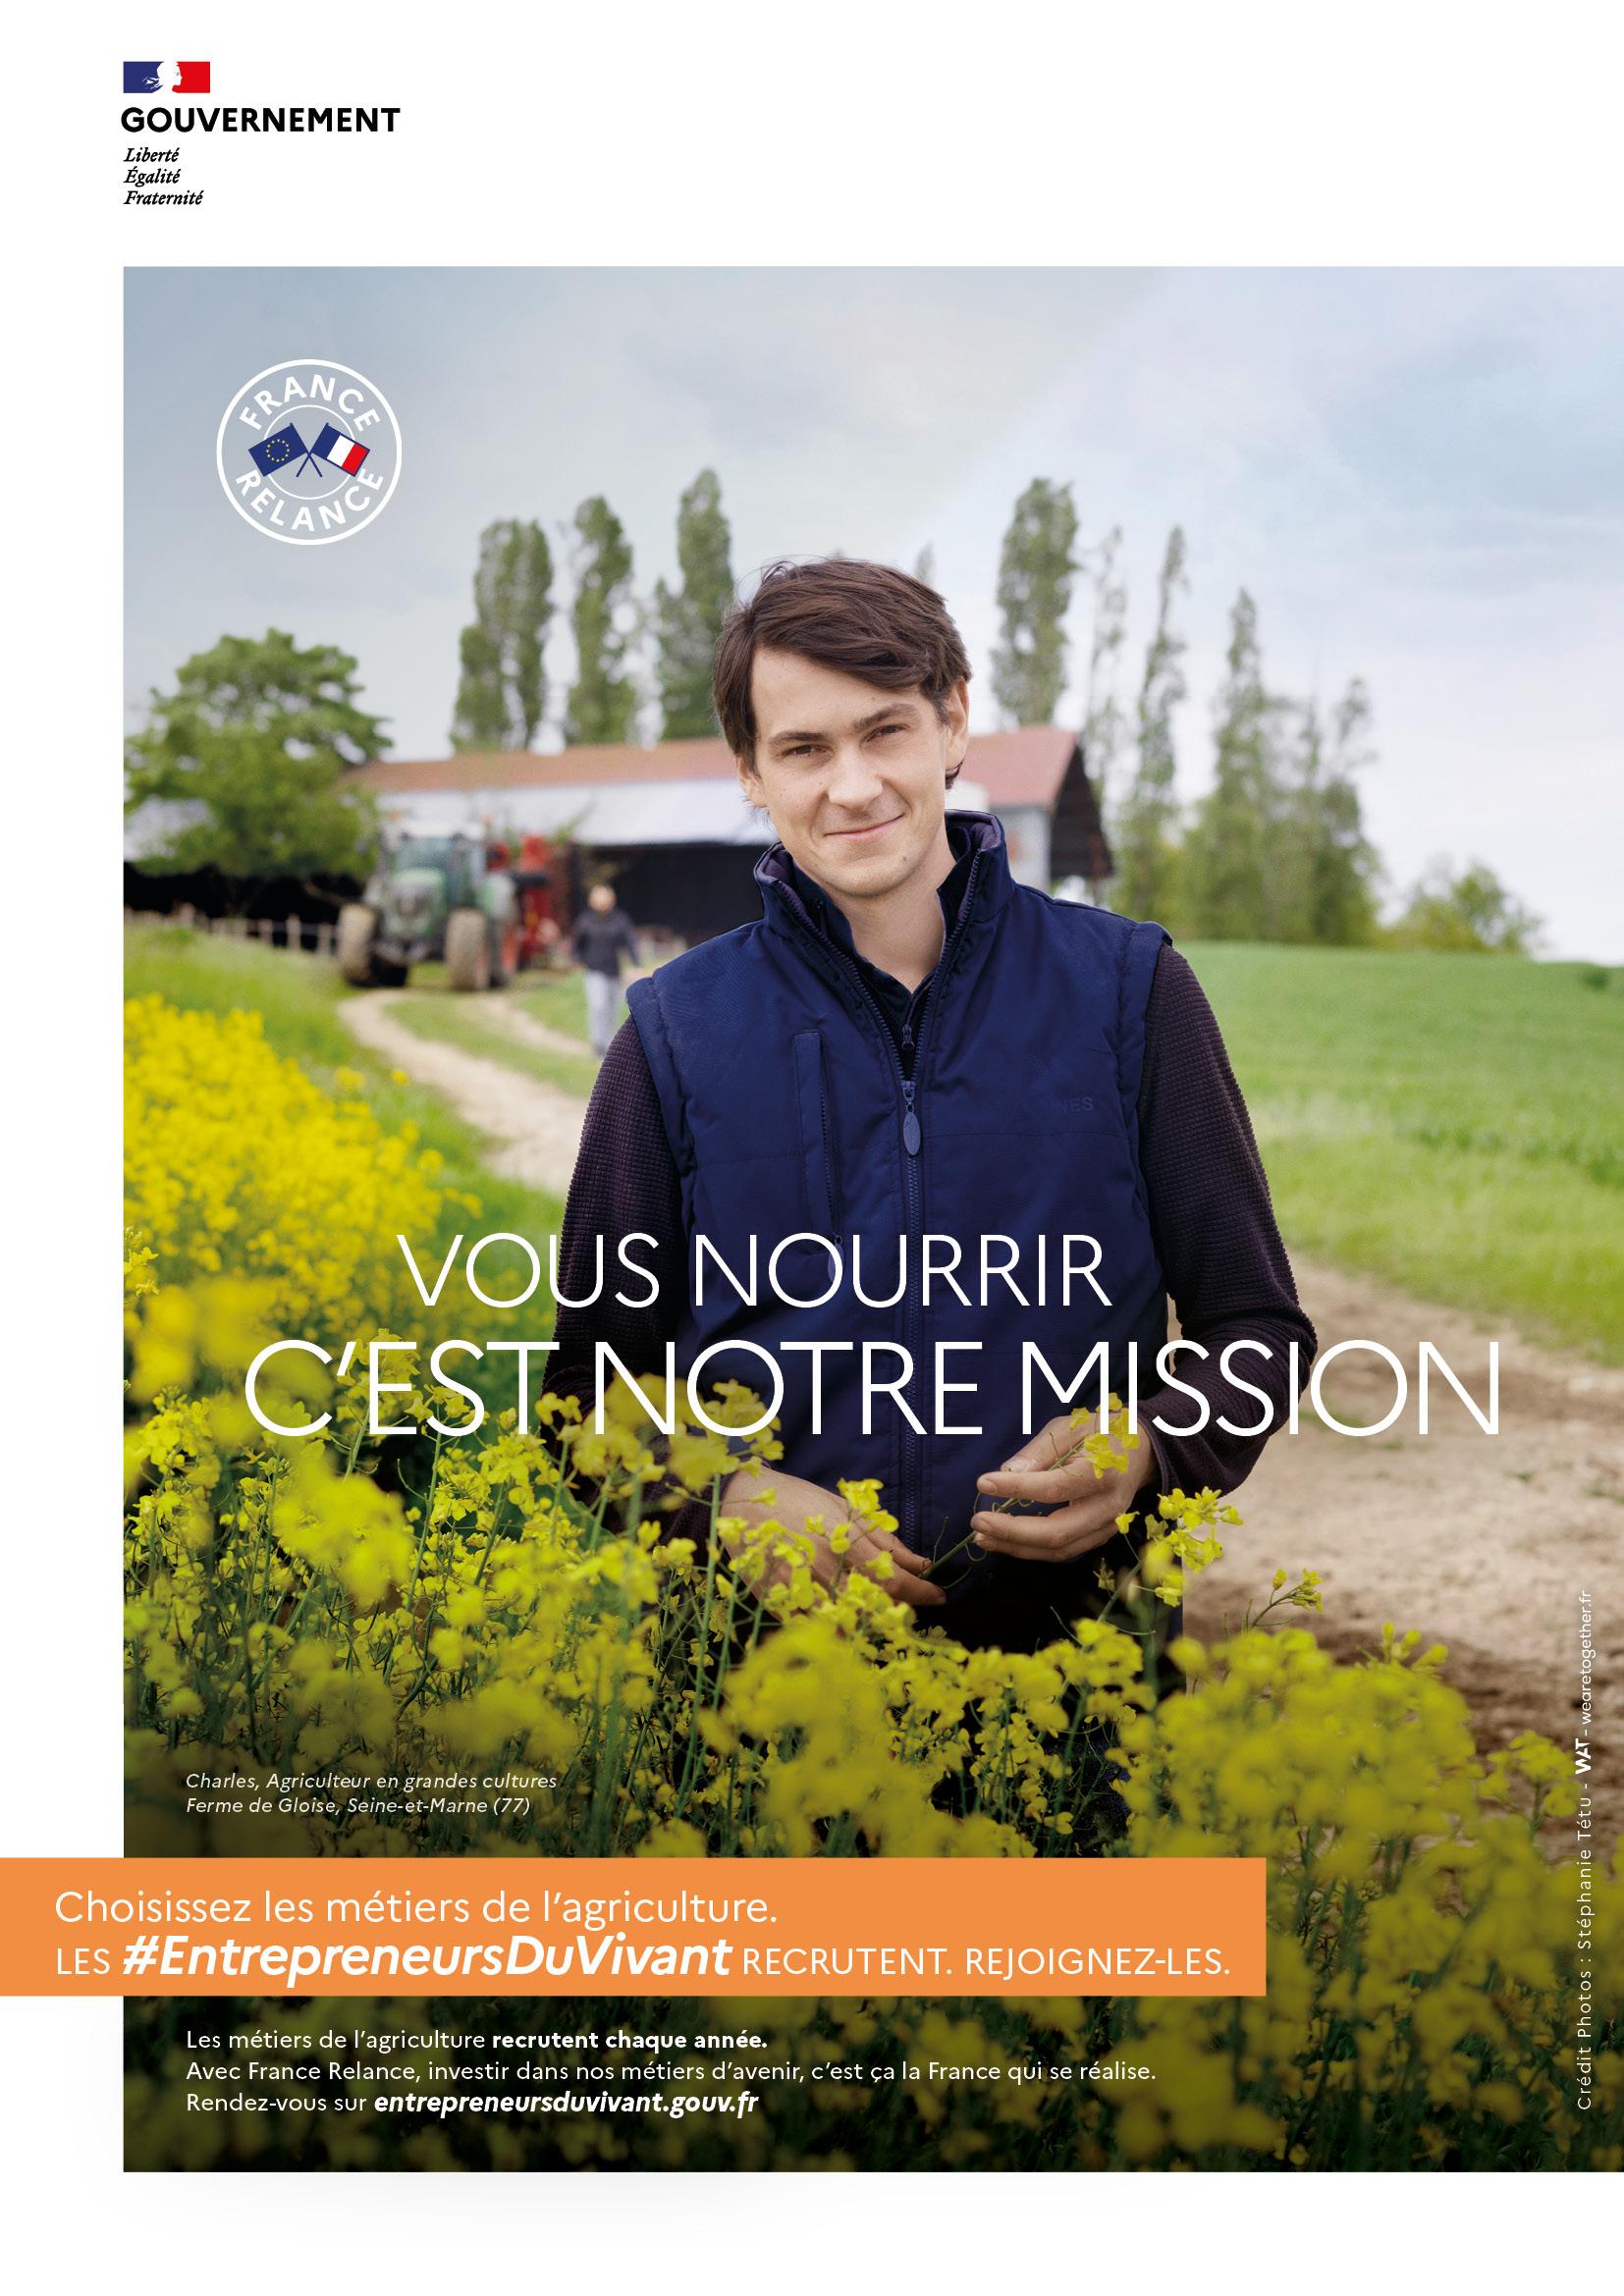 France Relance : la campagne « #LesEntrepreneursDuVivant recrutent »